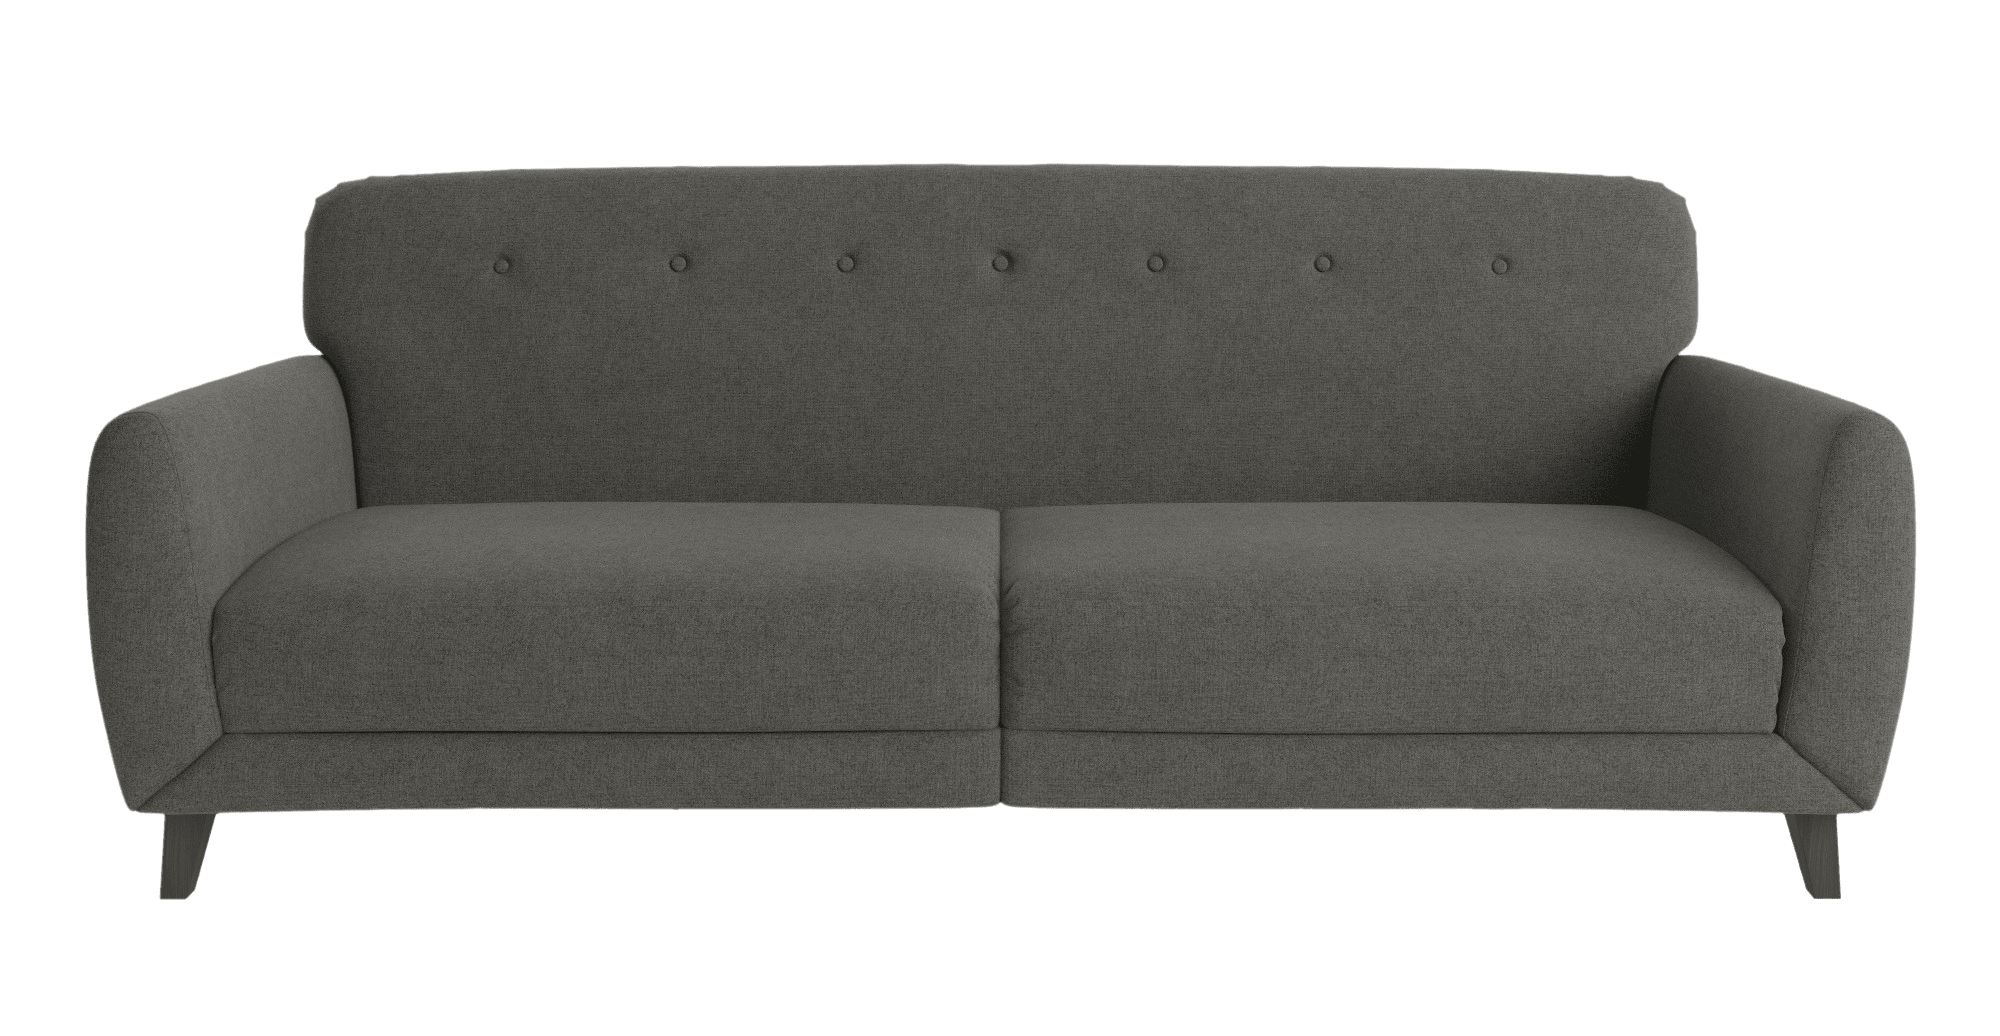 Sleeper Sofa PNG Free Download SVG Clip arts